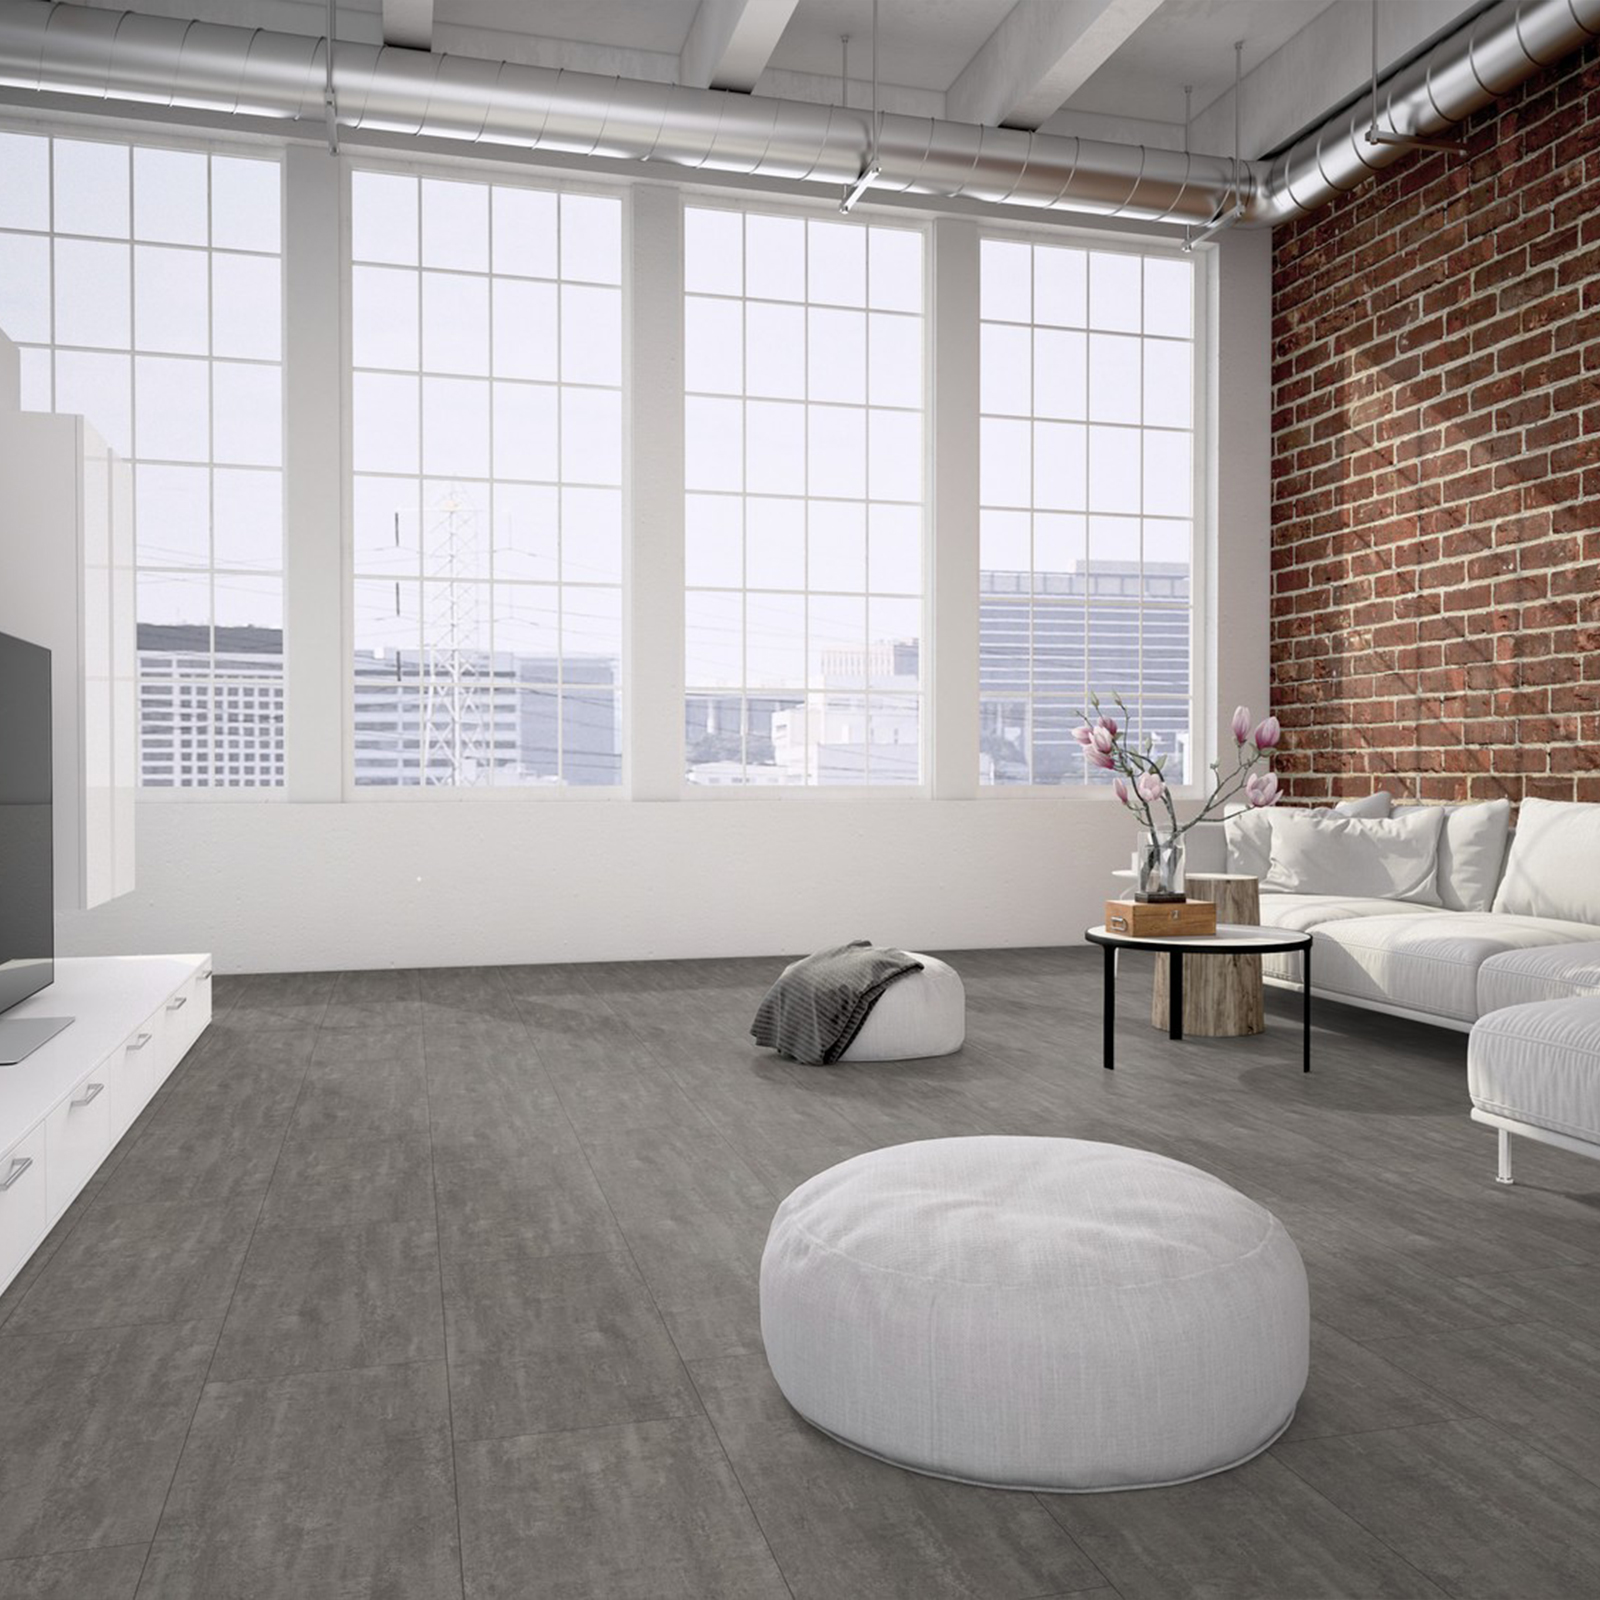 Bodenbelag Beton vinylboden pvc klick fliese bodenbelag steinoptik schiefer beton